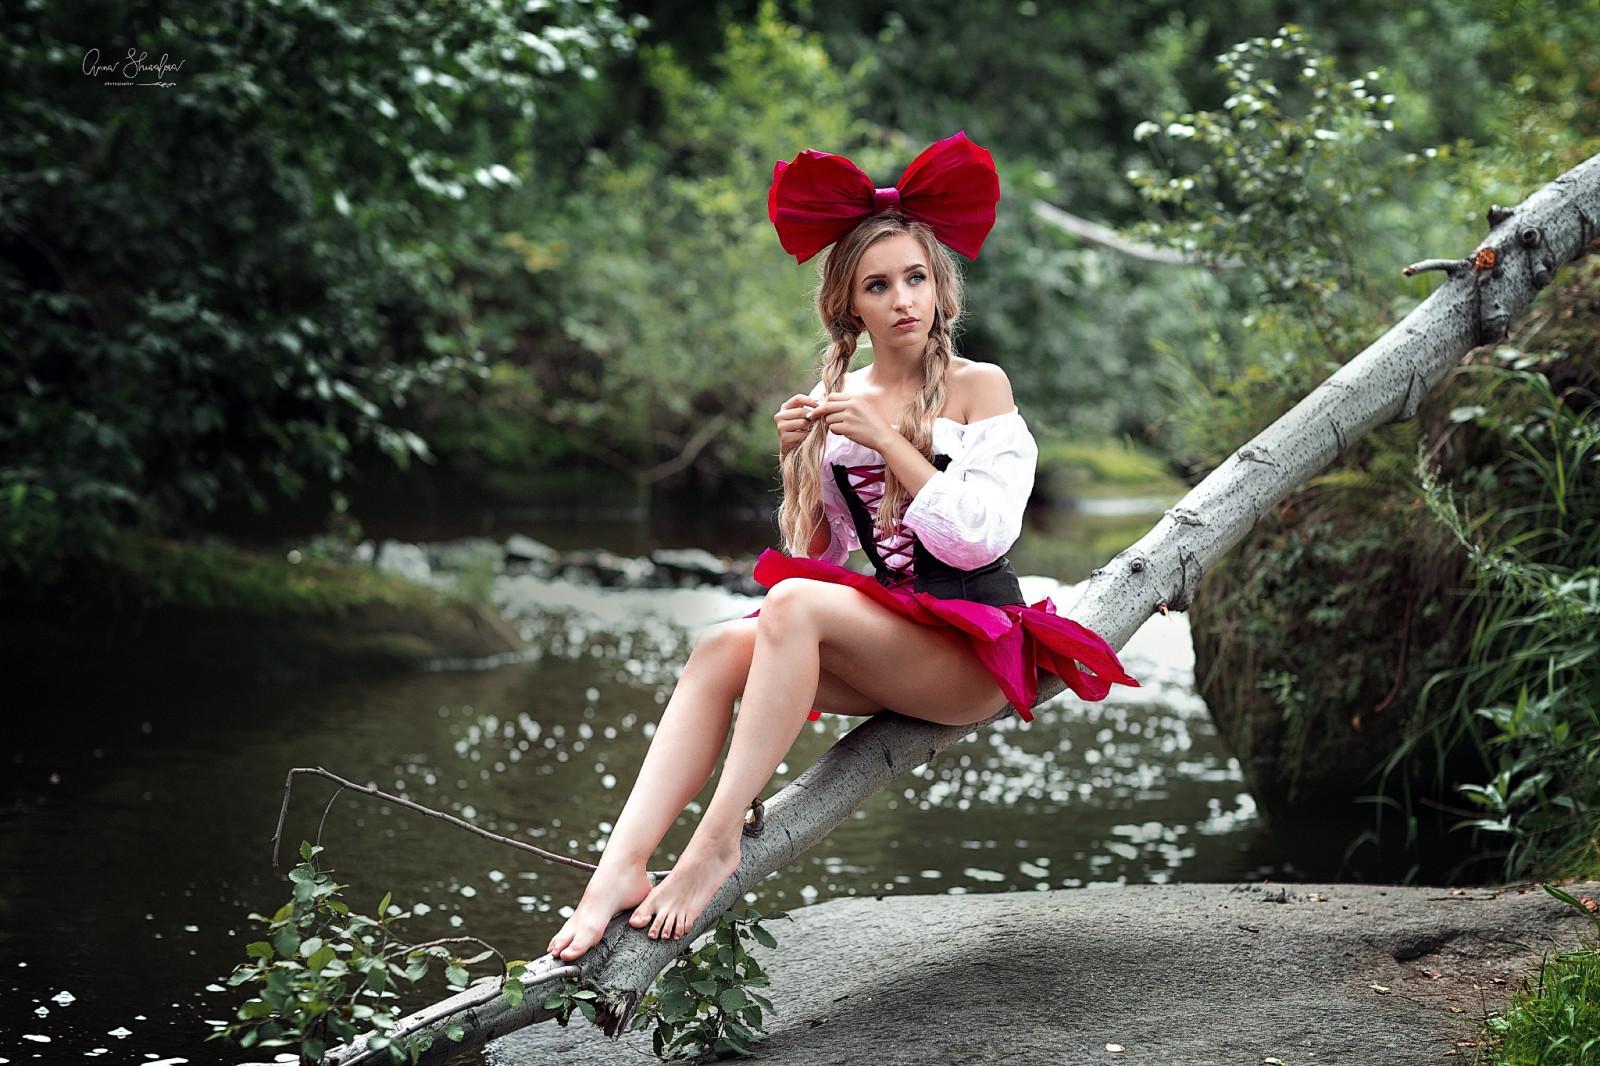 https://c.wallhere.com/photos/1e/70/women_model_blonde_long_hair_braids_braided_hair_looking_away_bare_shoulders-1590029.jpg!d